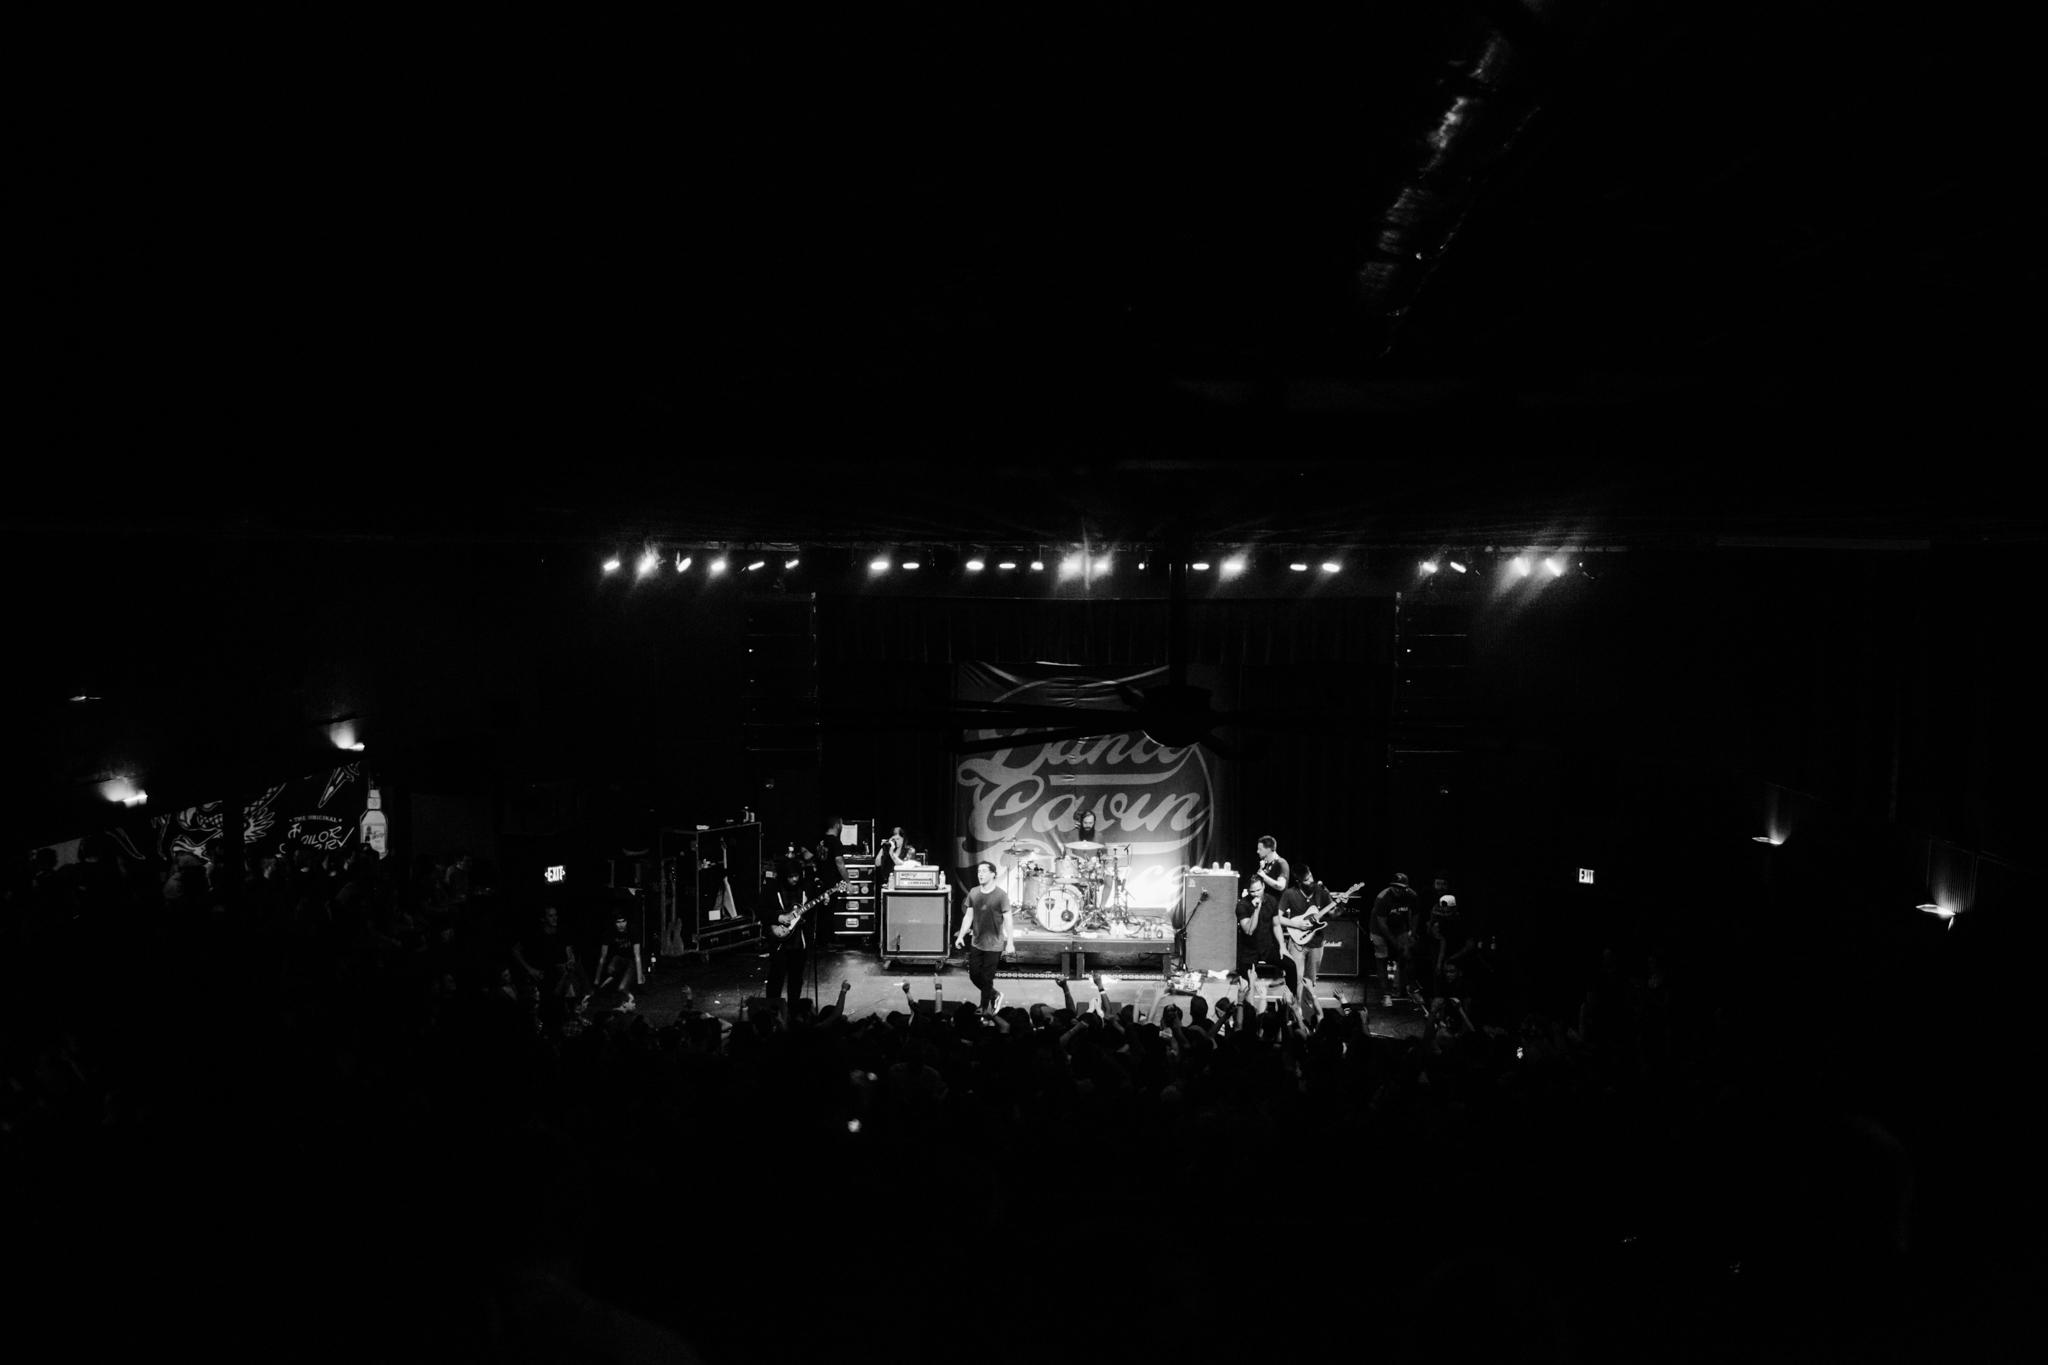 Lafferty Photo - Dance Gavin Dance 03.08.17-8575.jpg